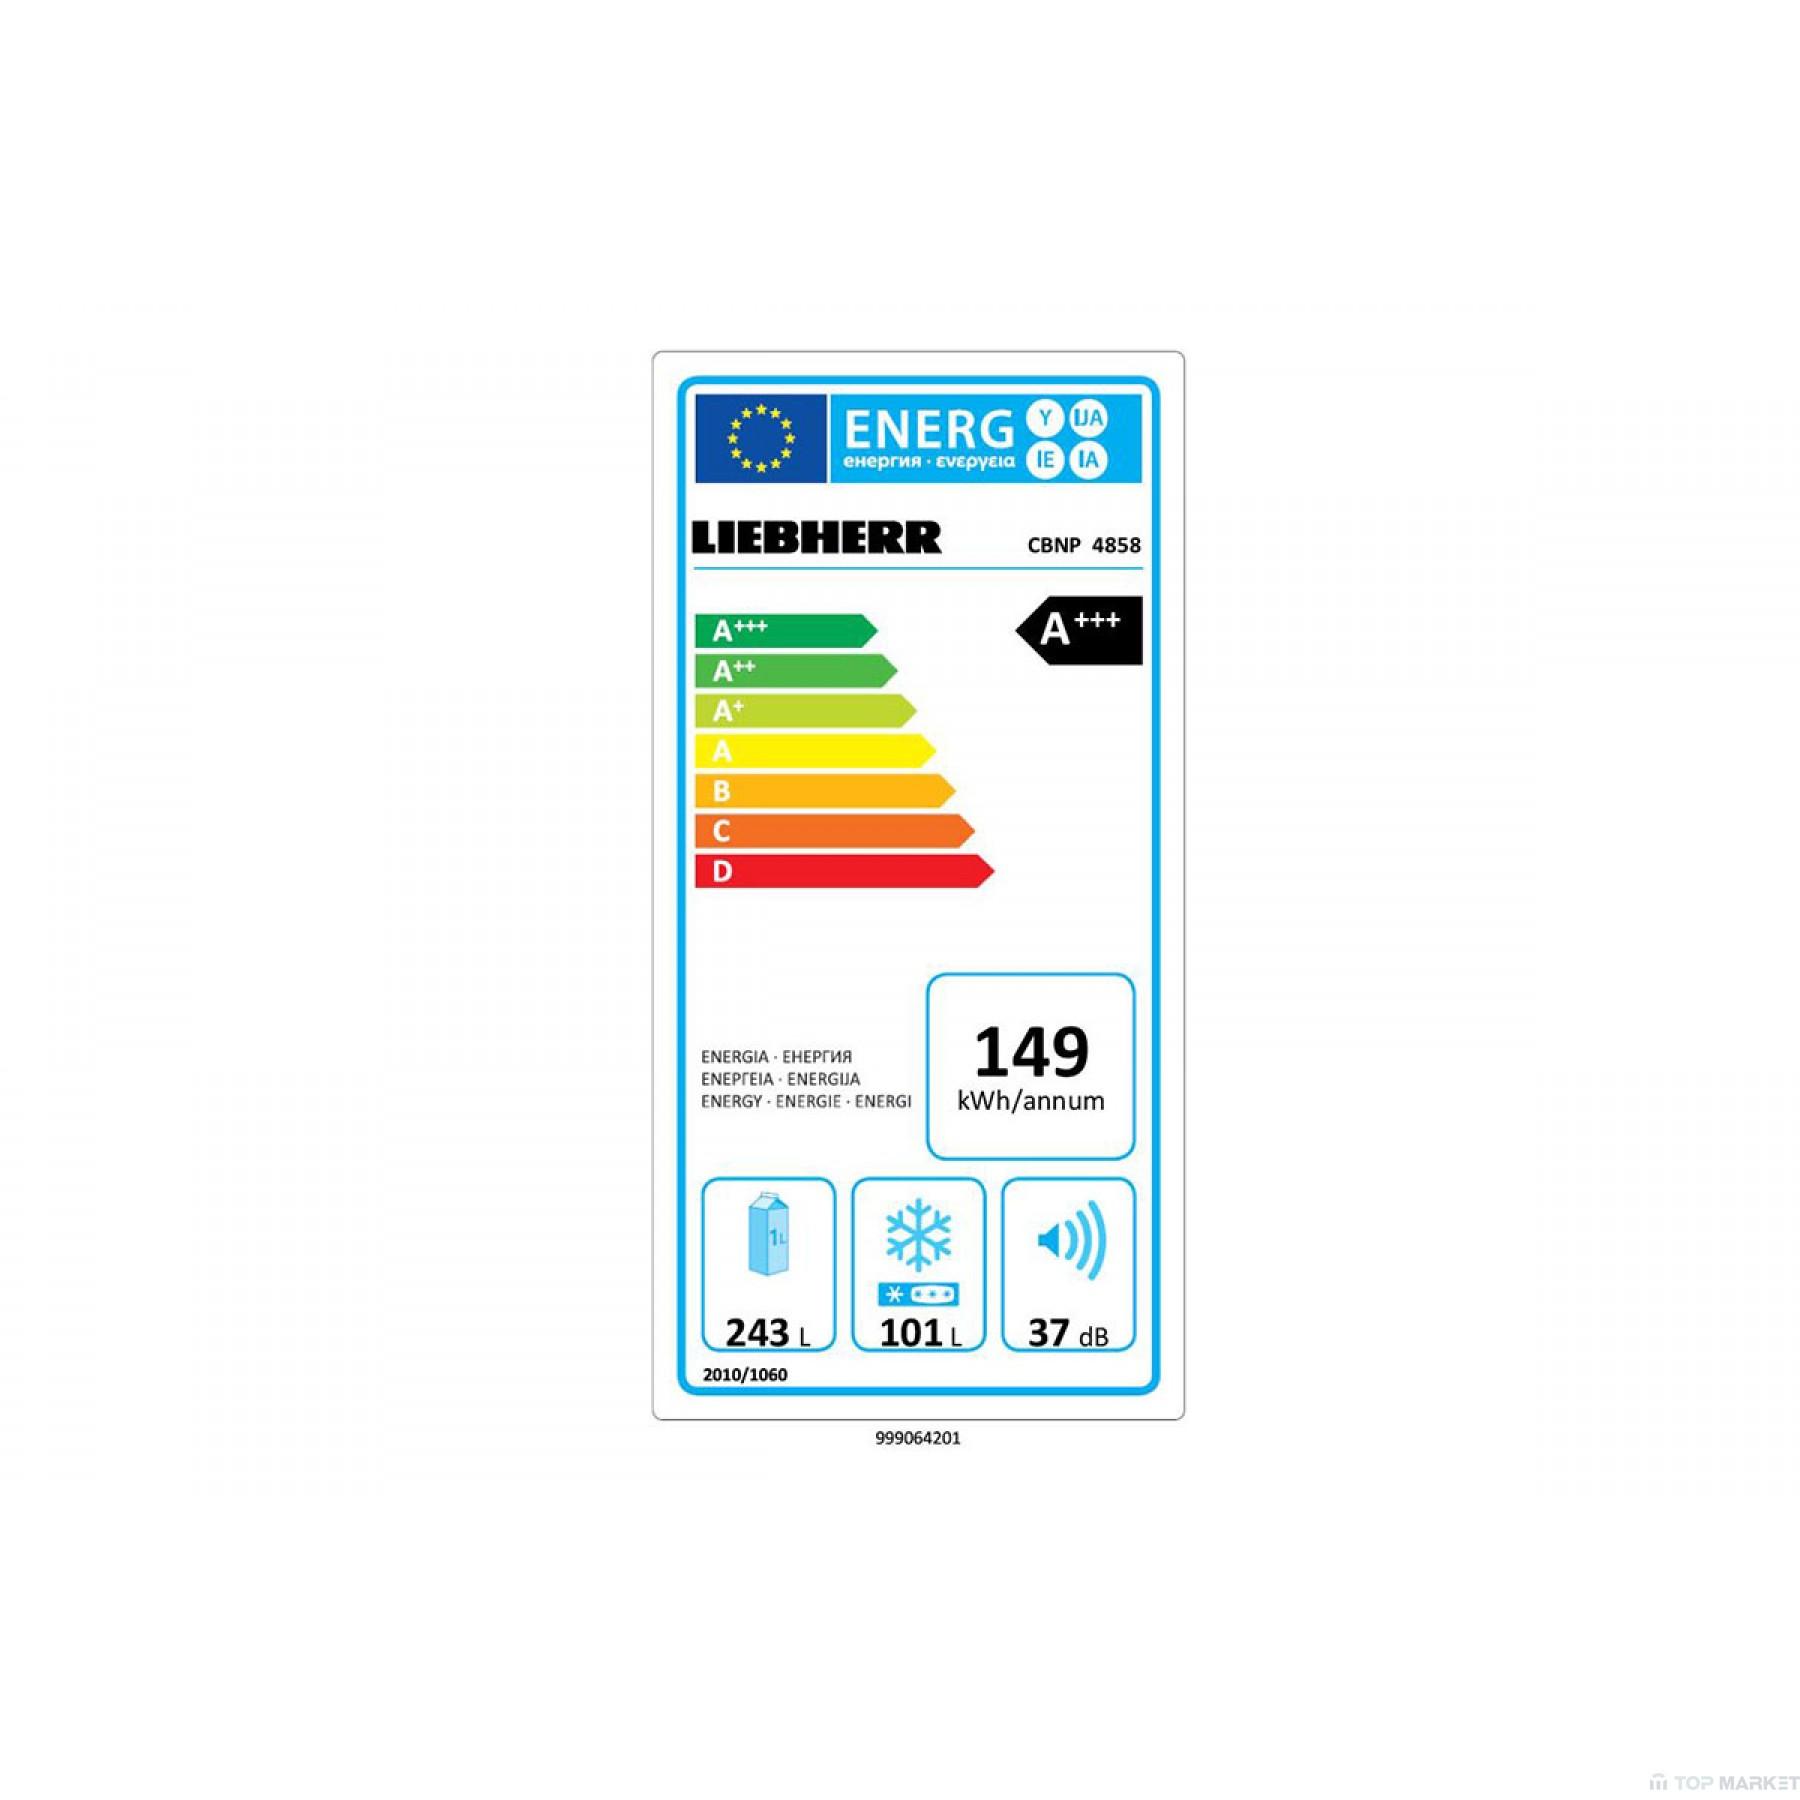 Хладилник   фризер LIEBHERR CBNP 4858